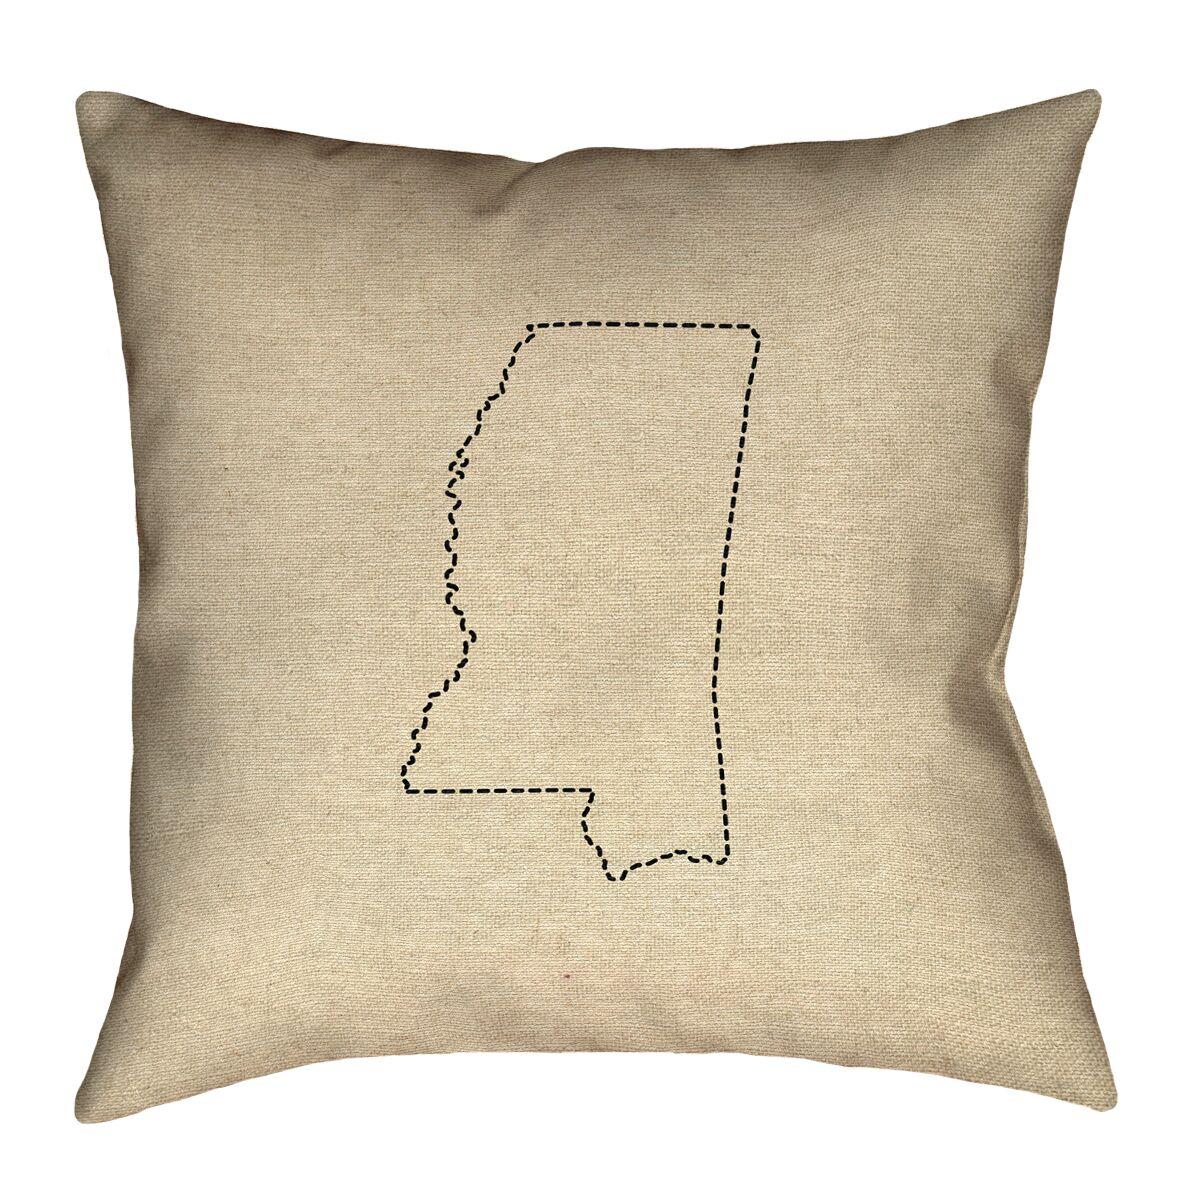 Austrinus Mississippi Dash Outline Throw Pillow Size: 20